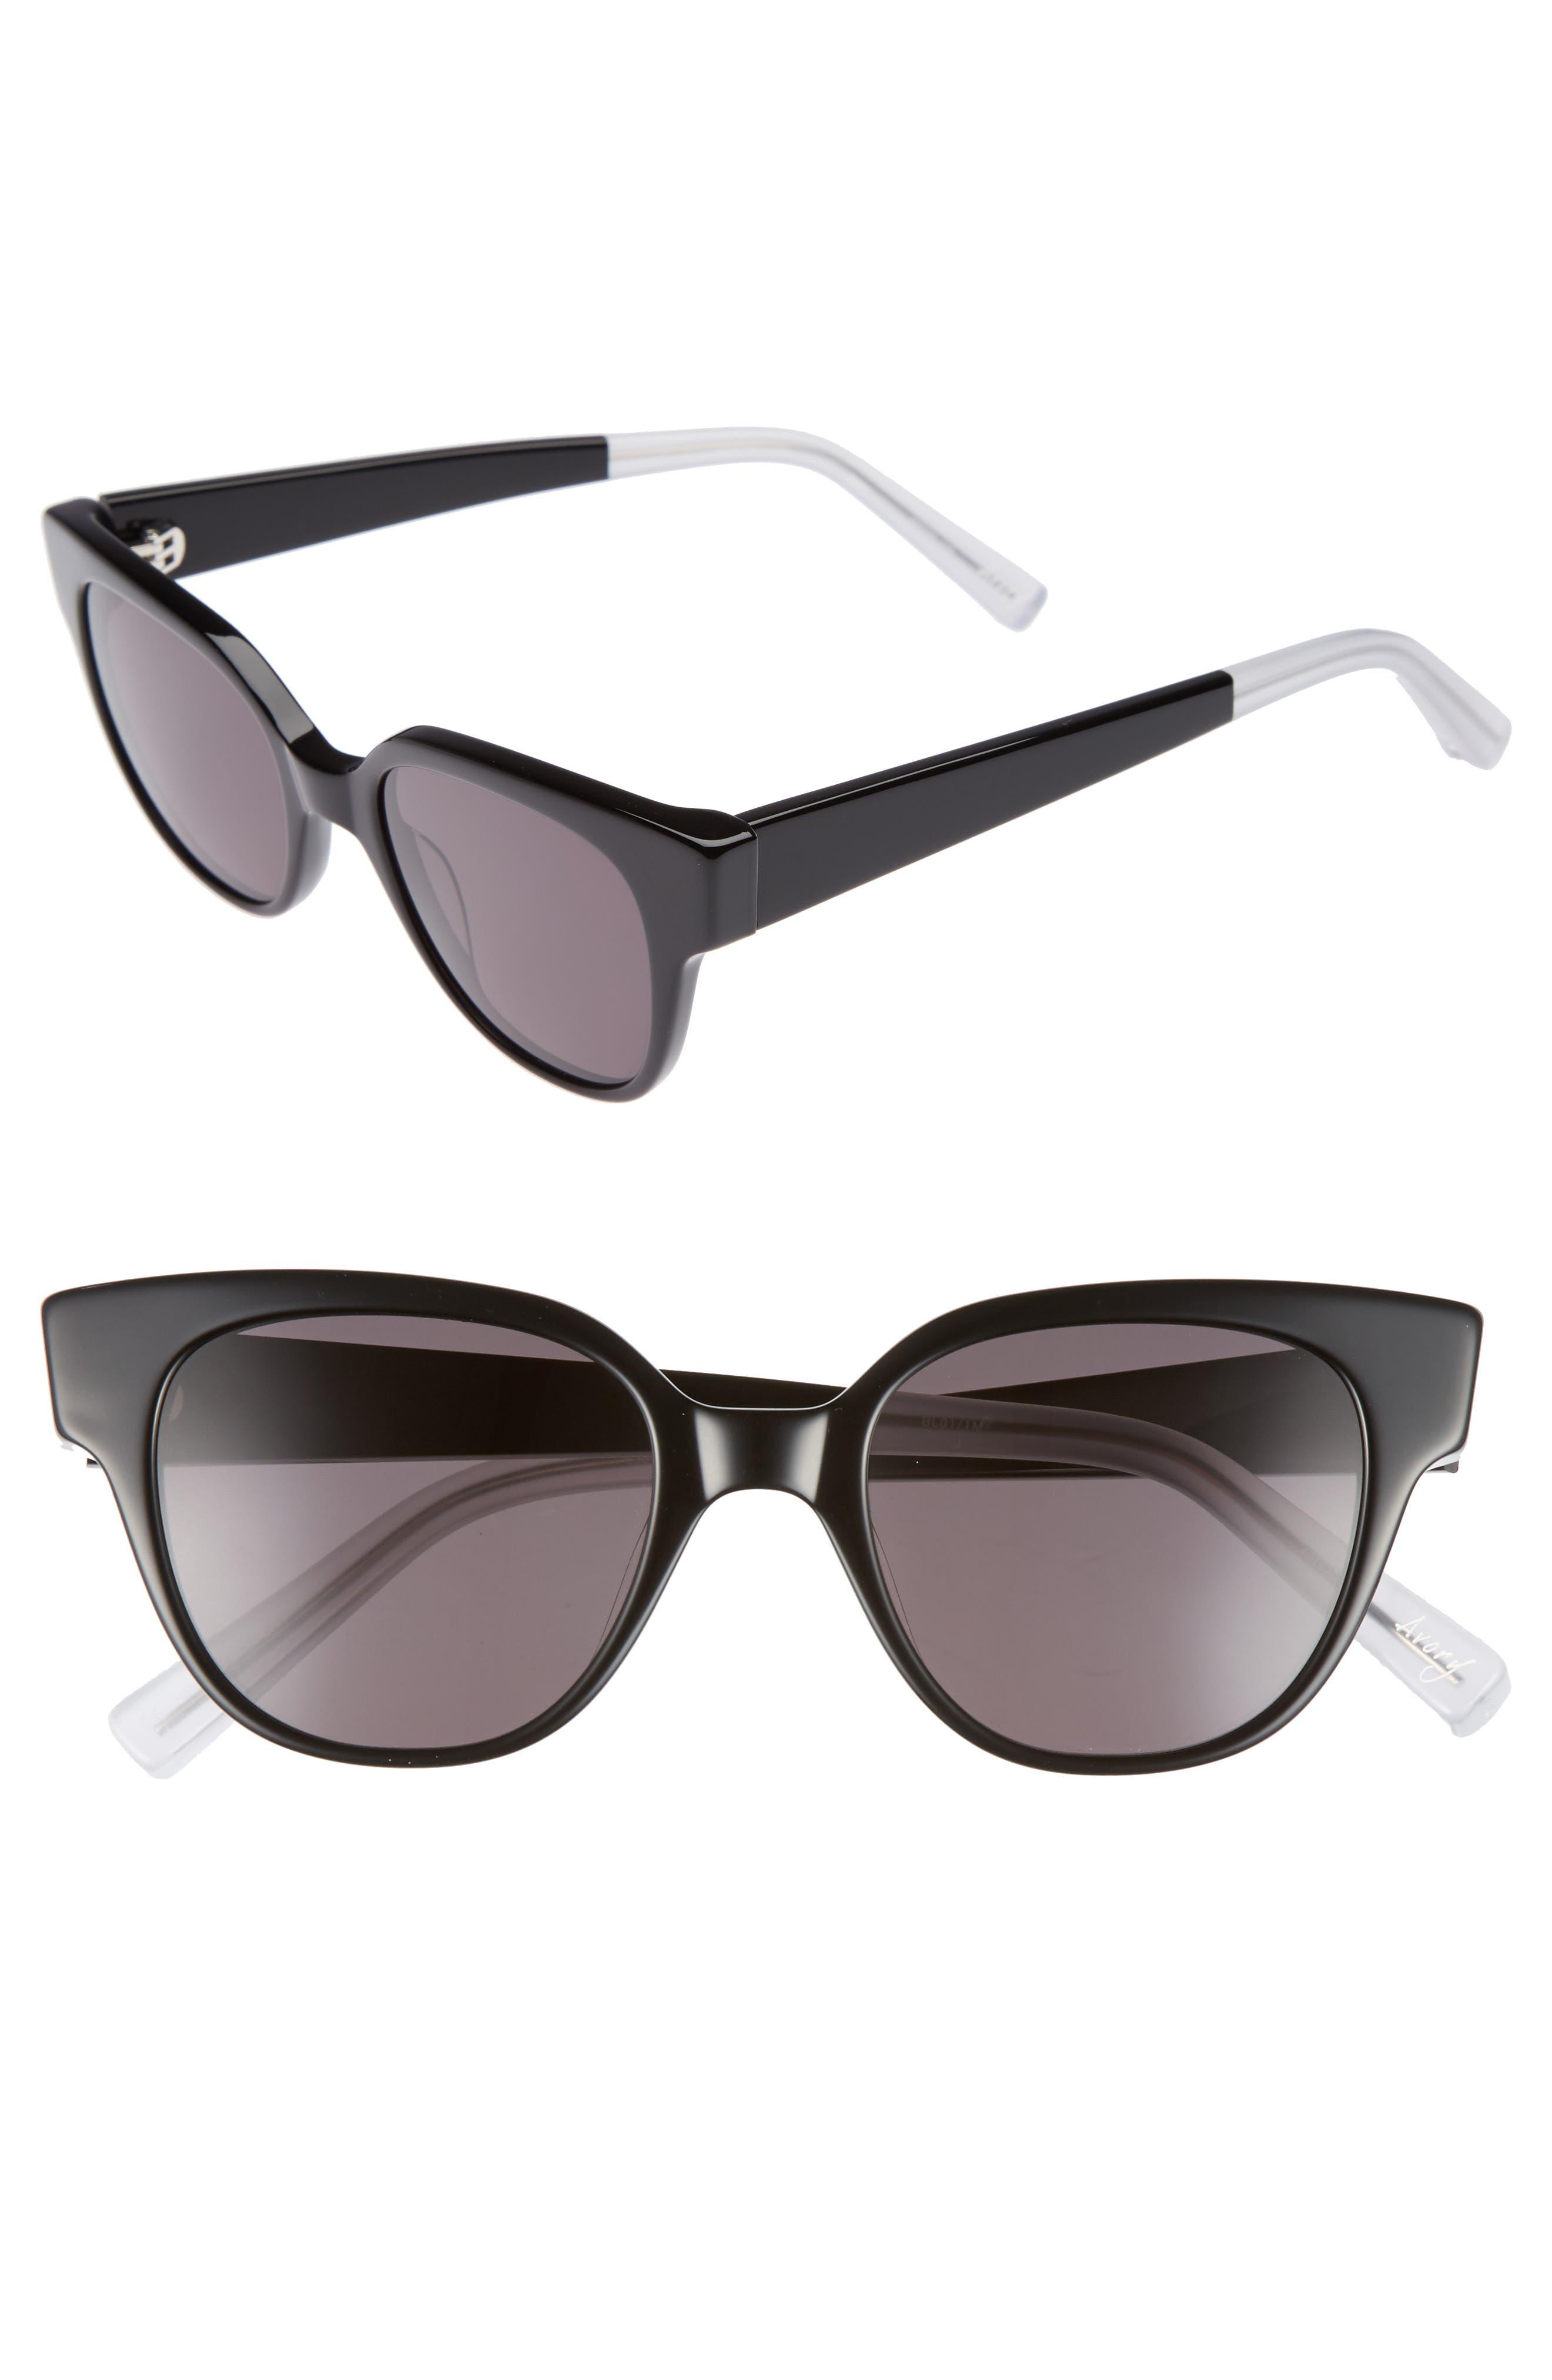 Avory 49mm Cat Eye Sunglasses,                         Main,                         color,